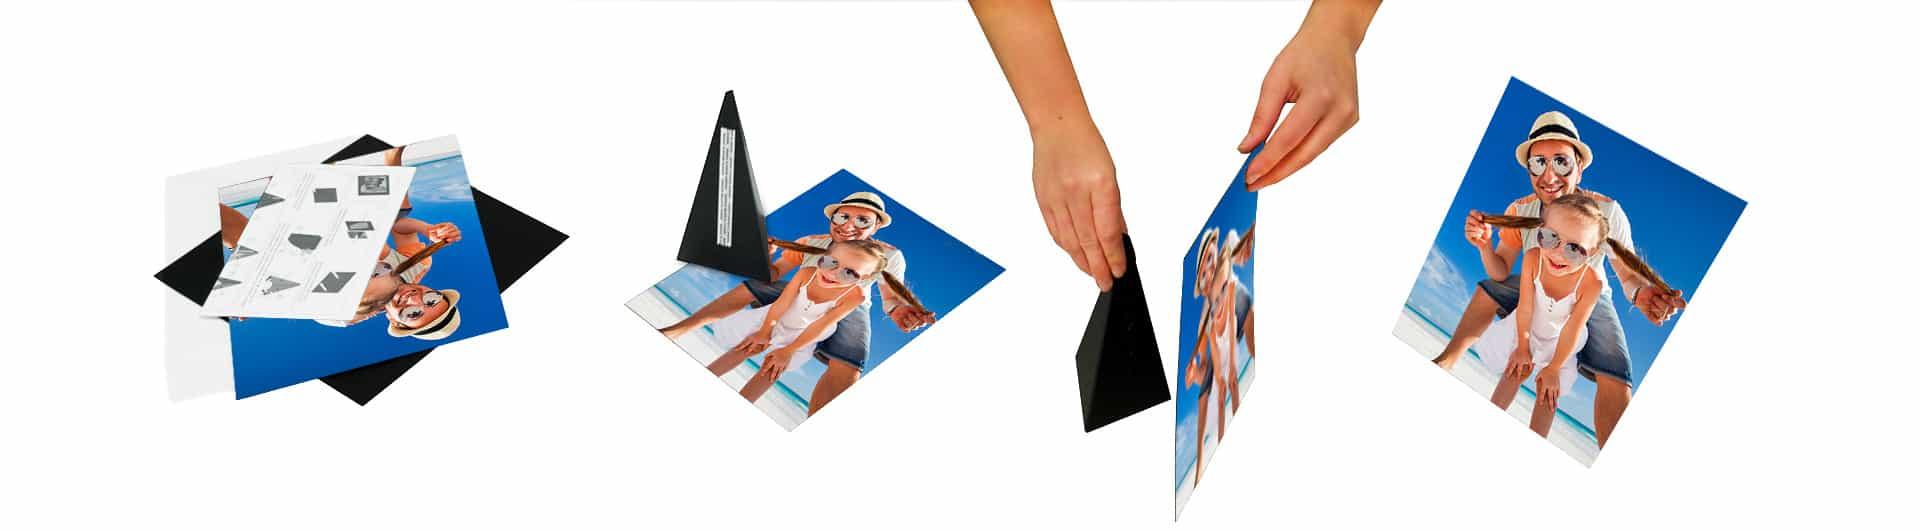 mini canvas photo prints assembly